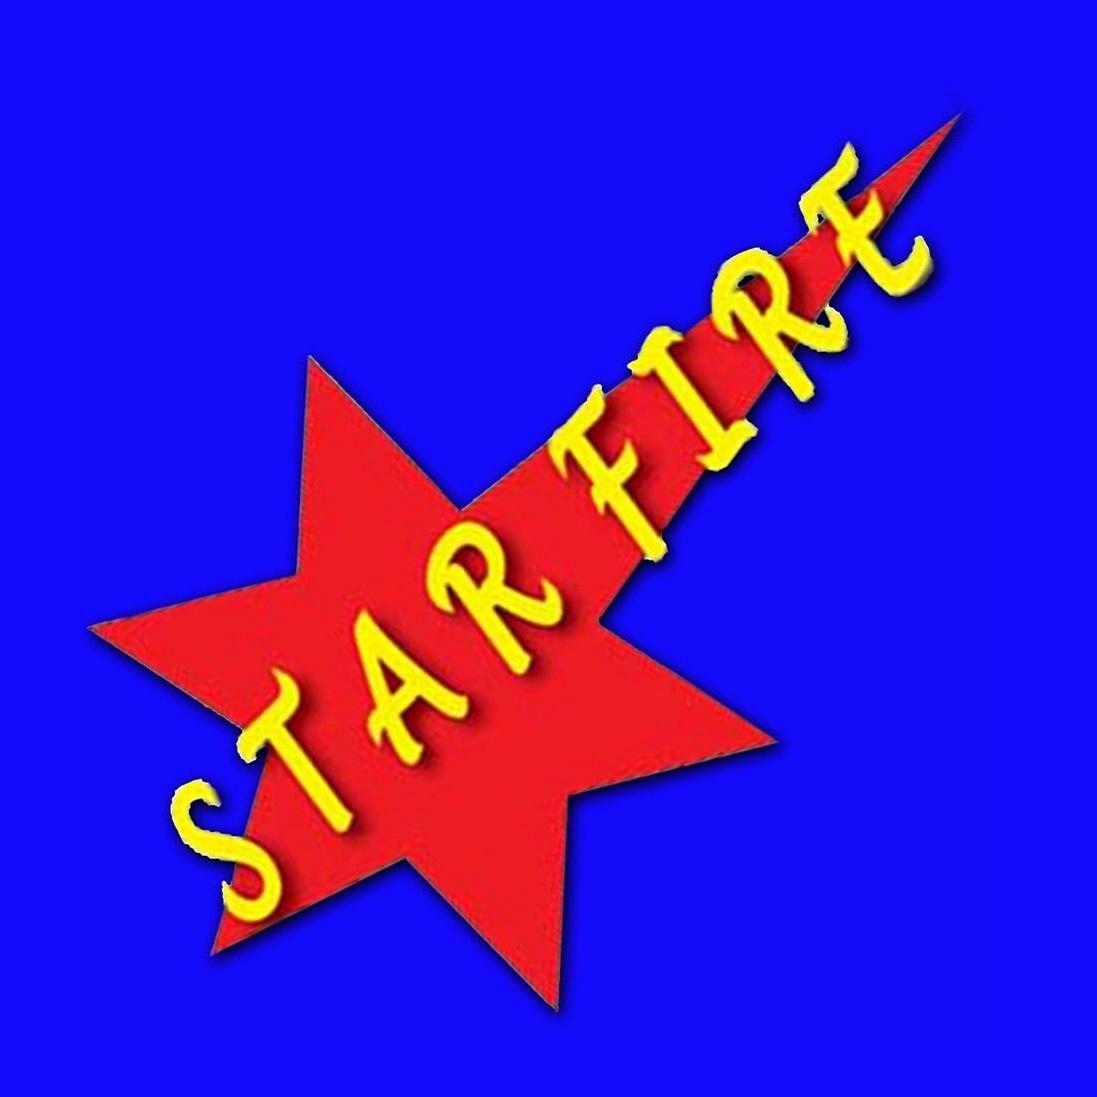 Star Fire Protection - Torquay, Devon TQ2 6DY - 07716 244775 | ShowMeLocal.com